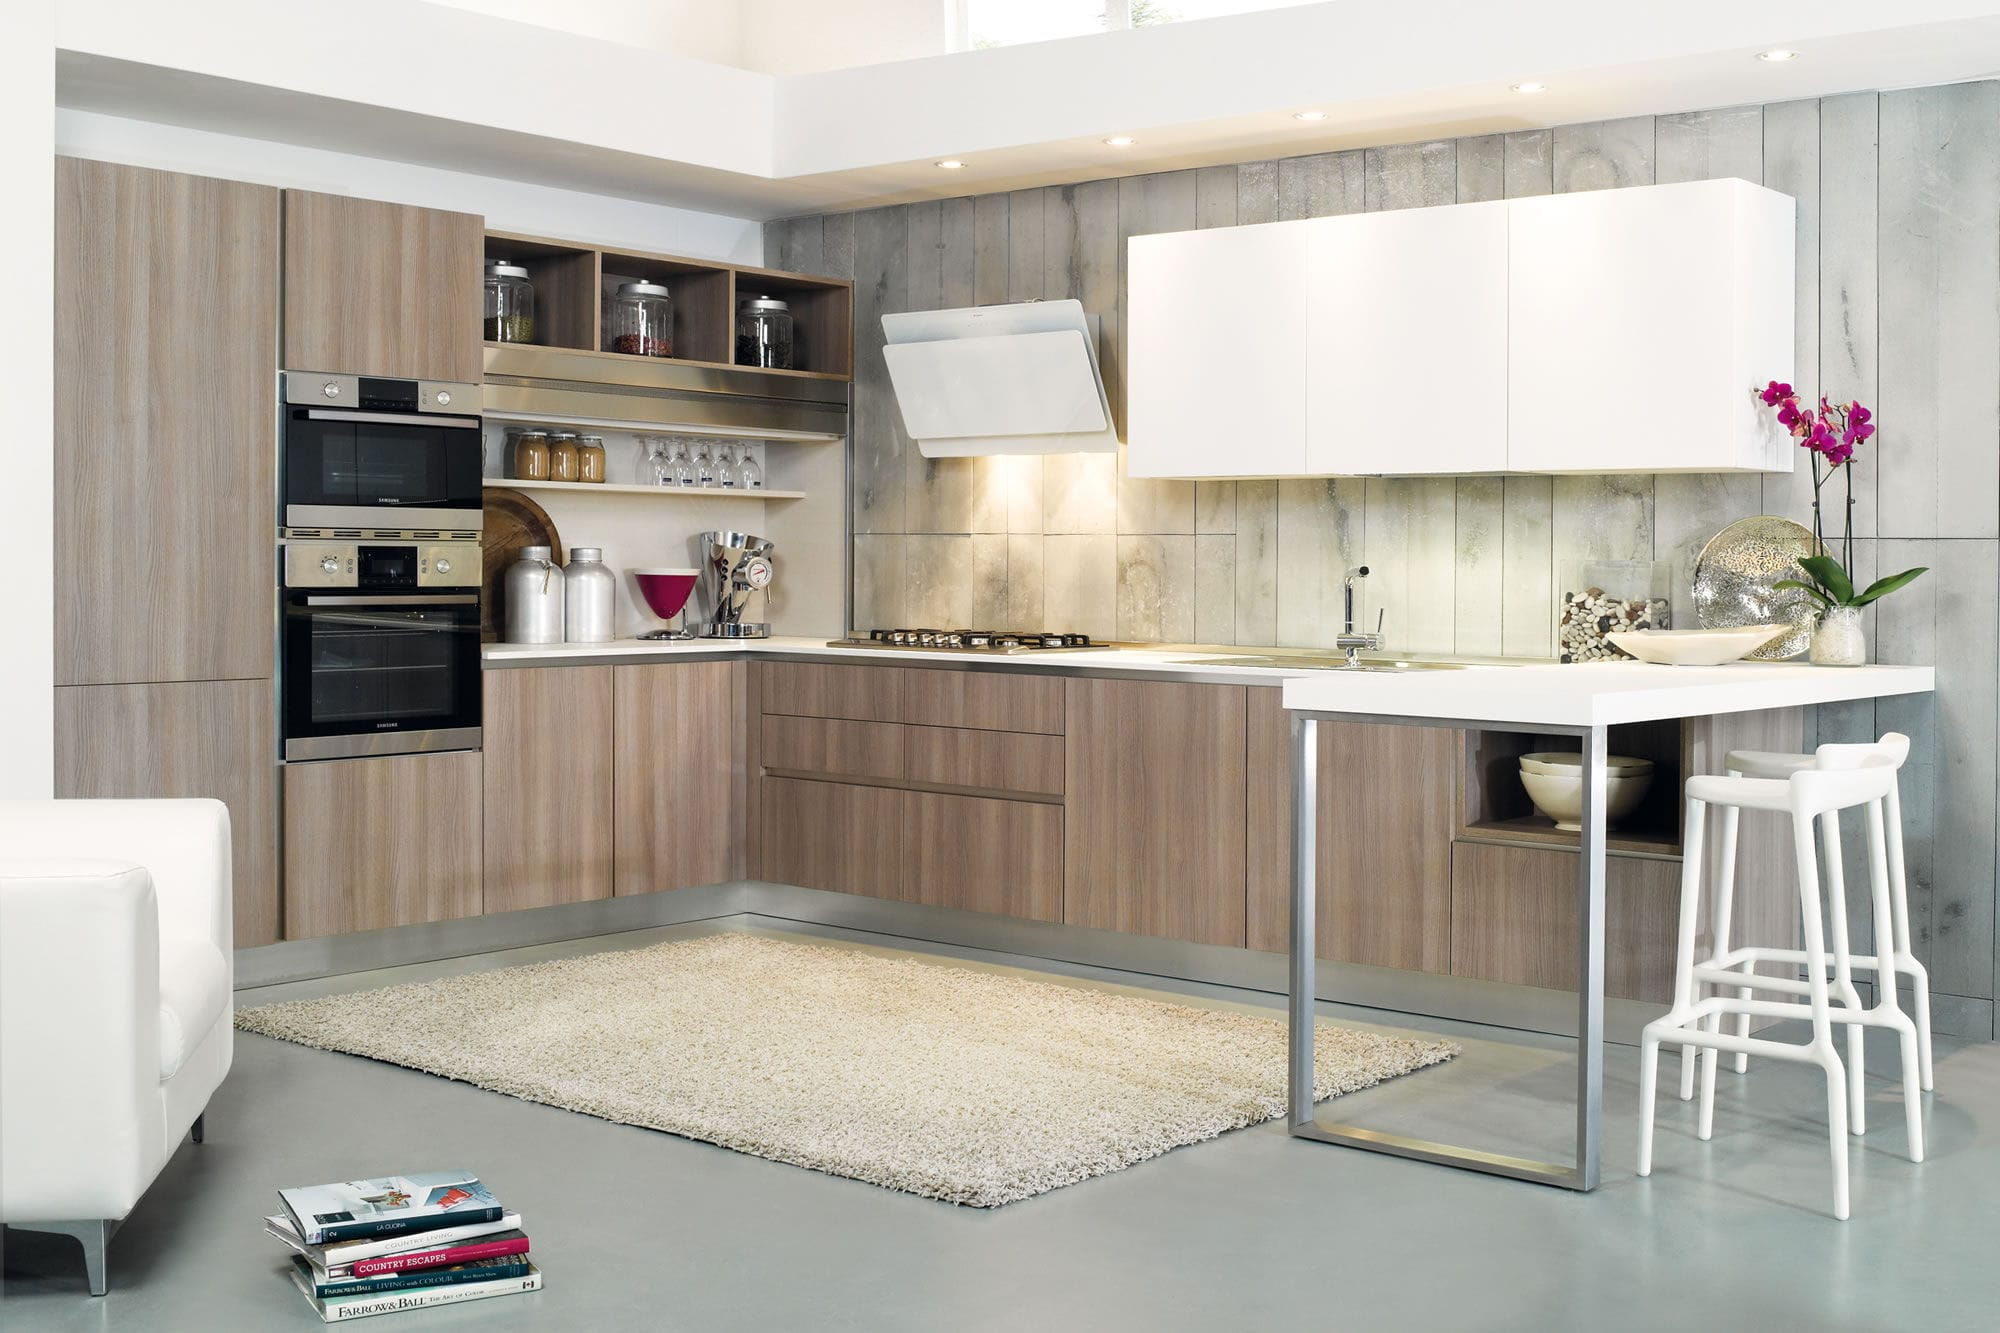 Moderne Küche / Holz / Melamin / L-förmig - JOLIE - Aurora cucine